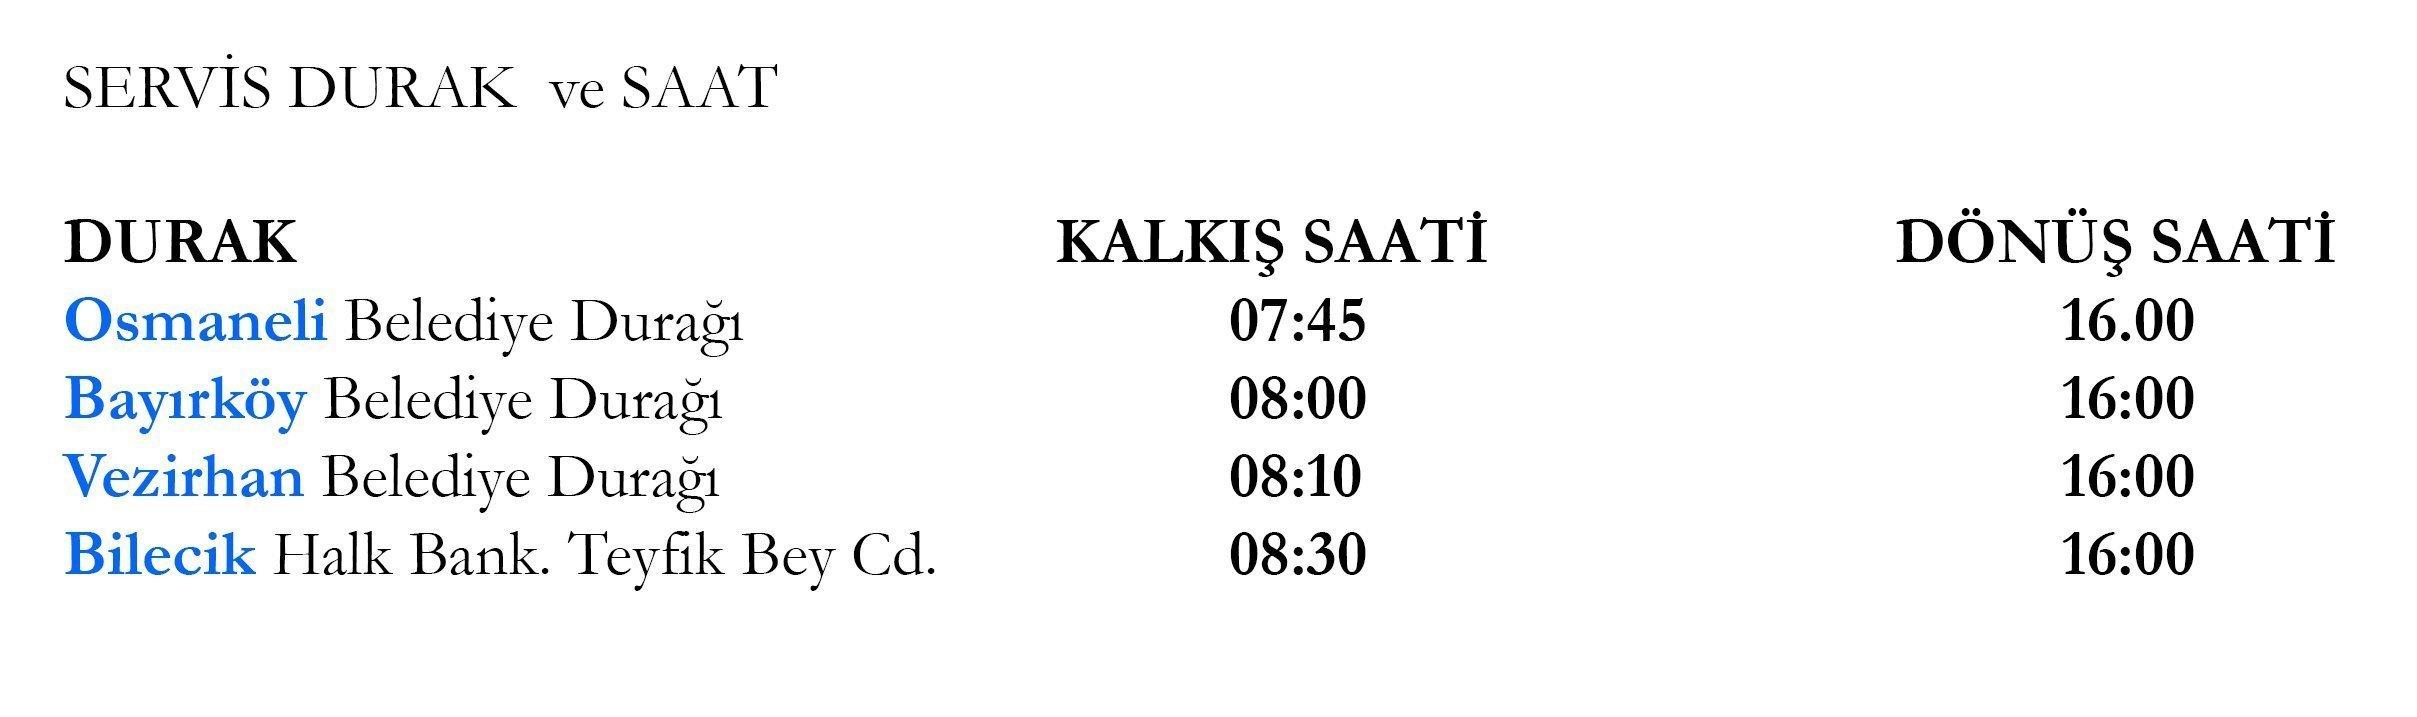 Hasta Servis Hizmeti